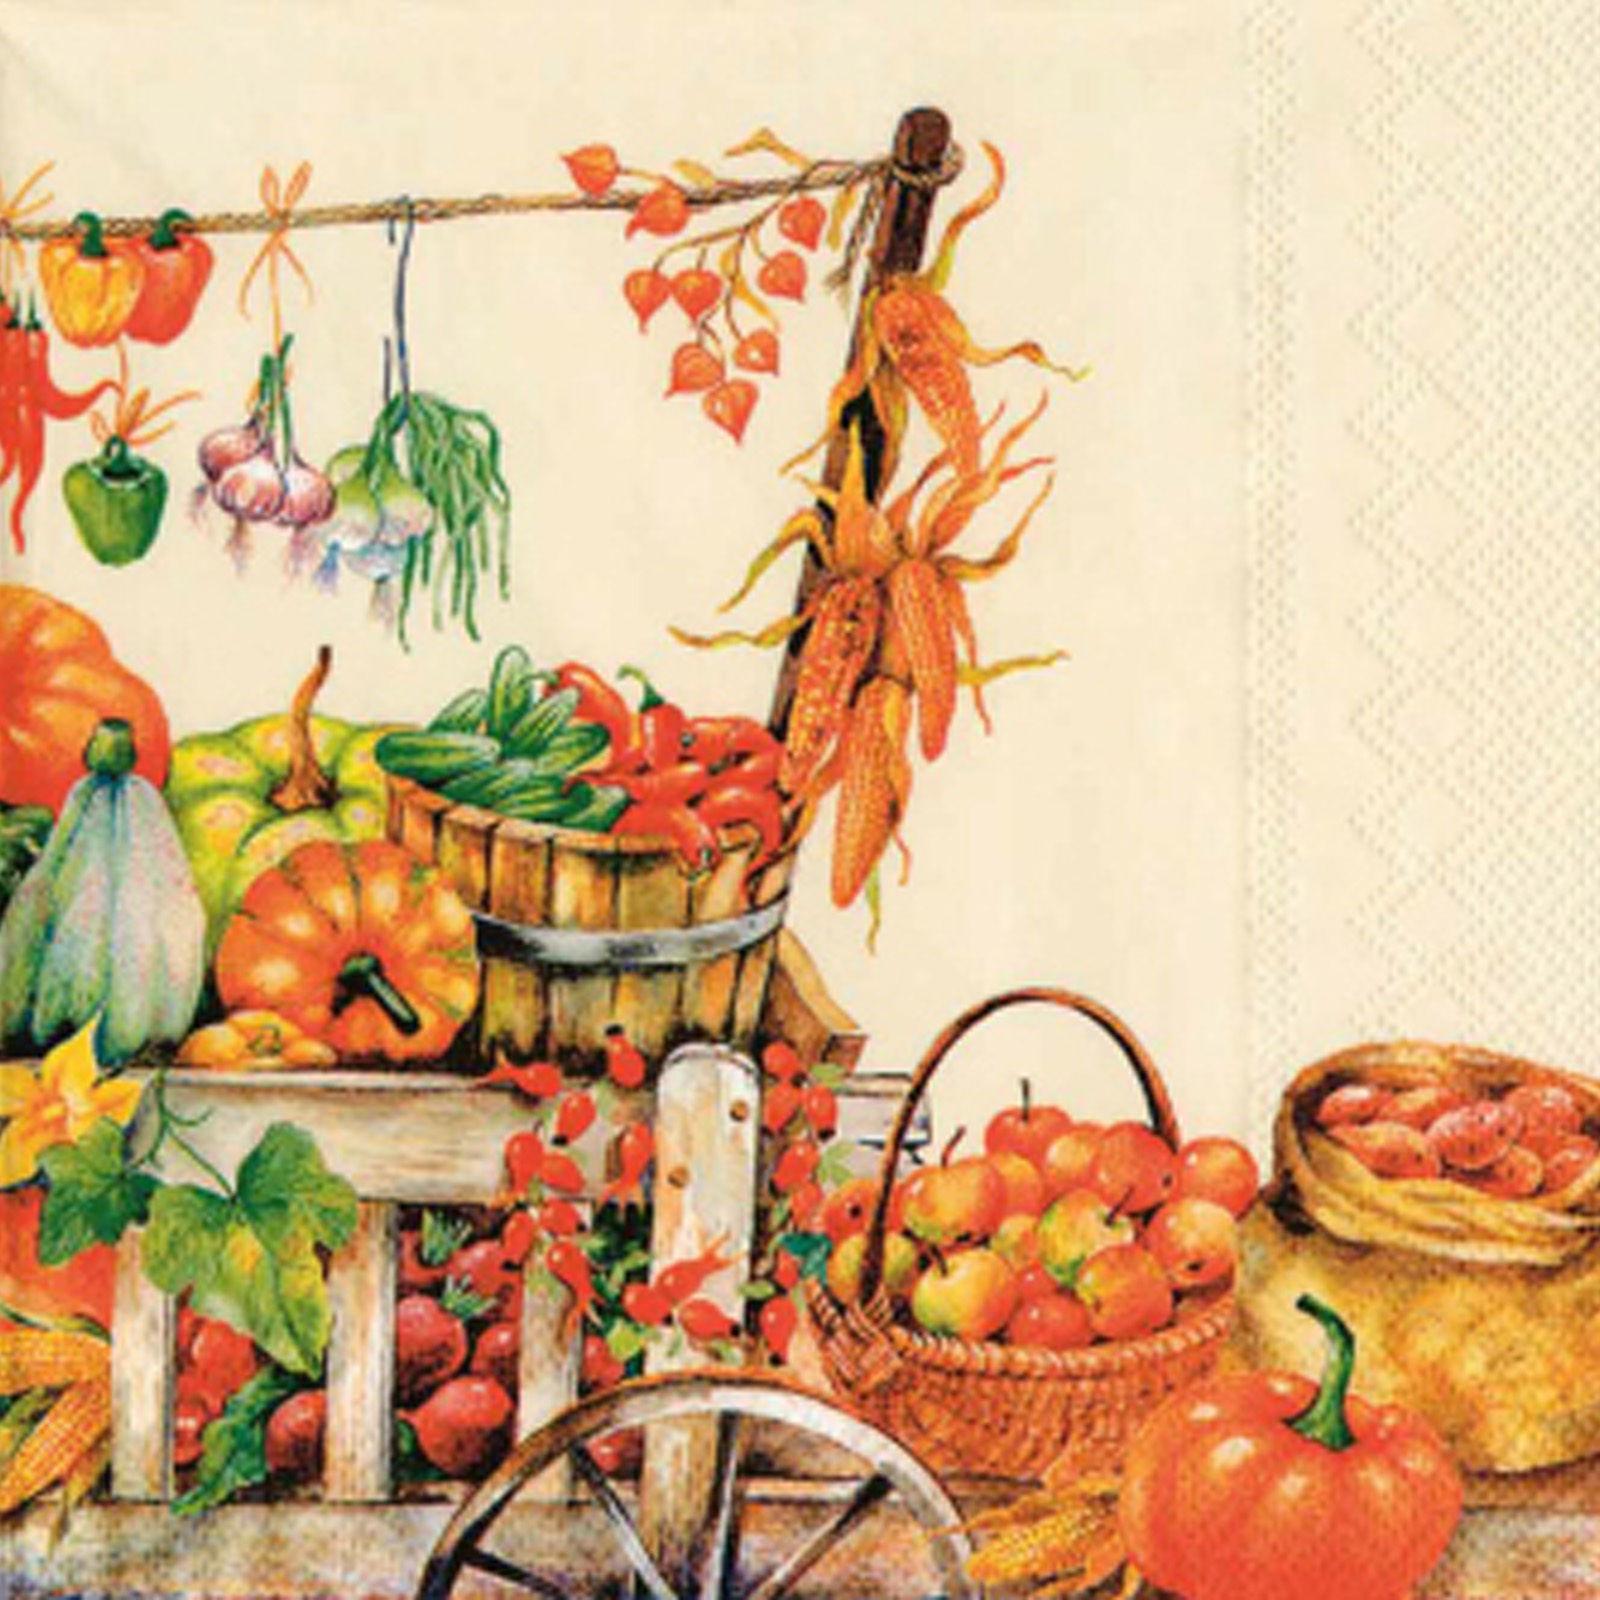 Thanksgiving Themed Pictures Tecn Zcesg Kbrzgyrlq